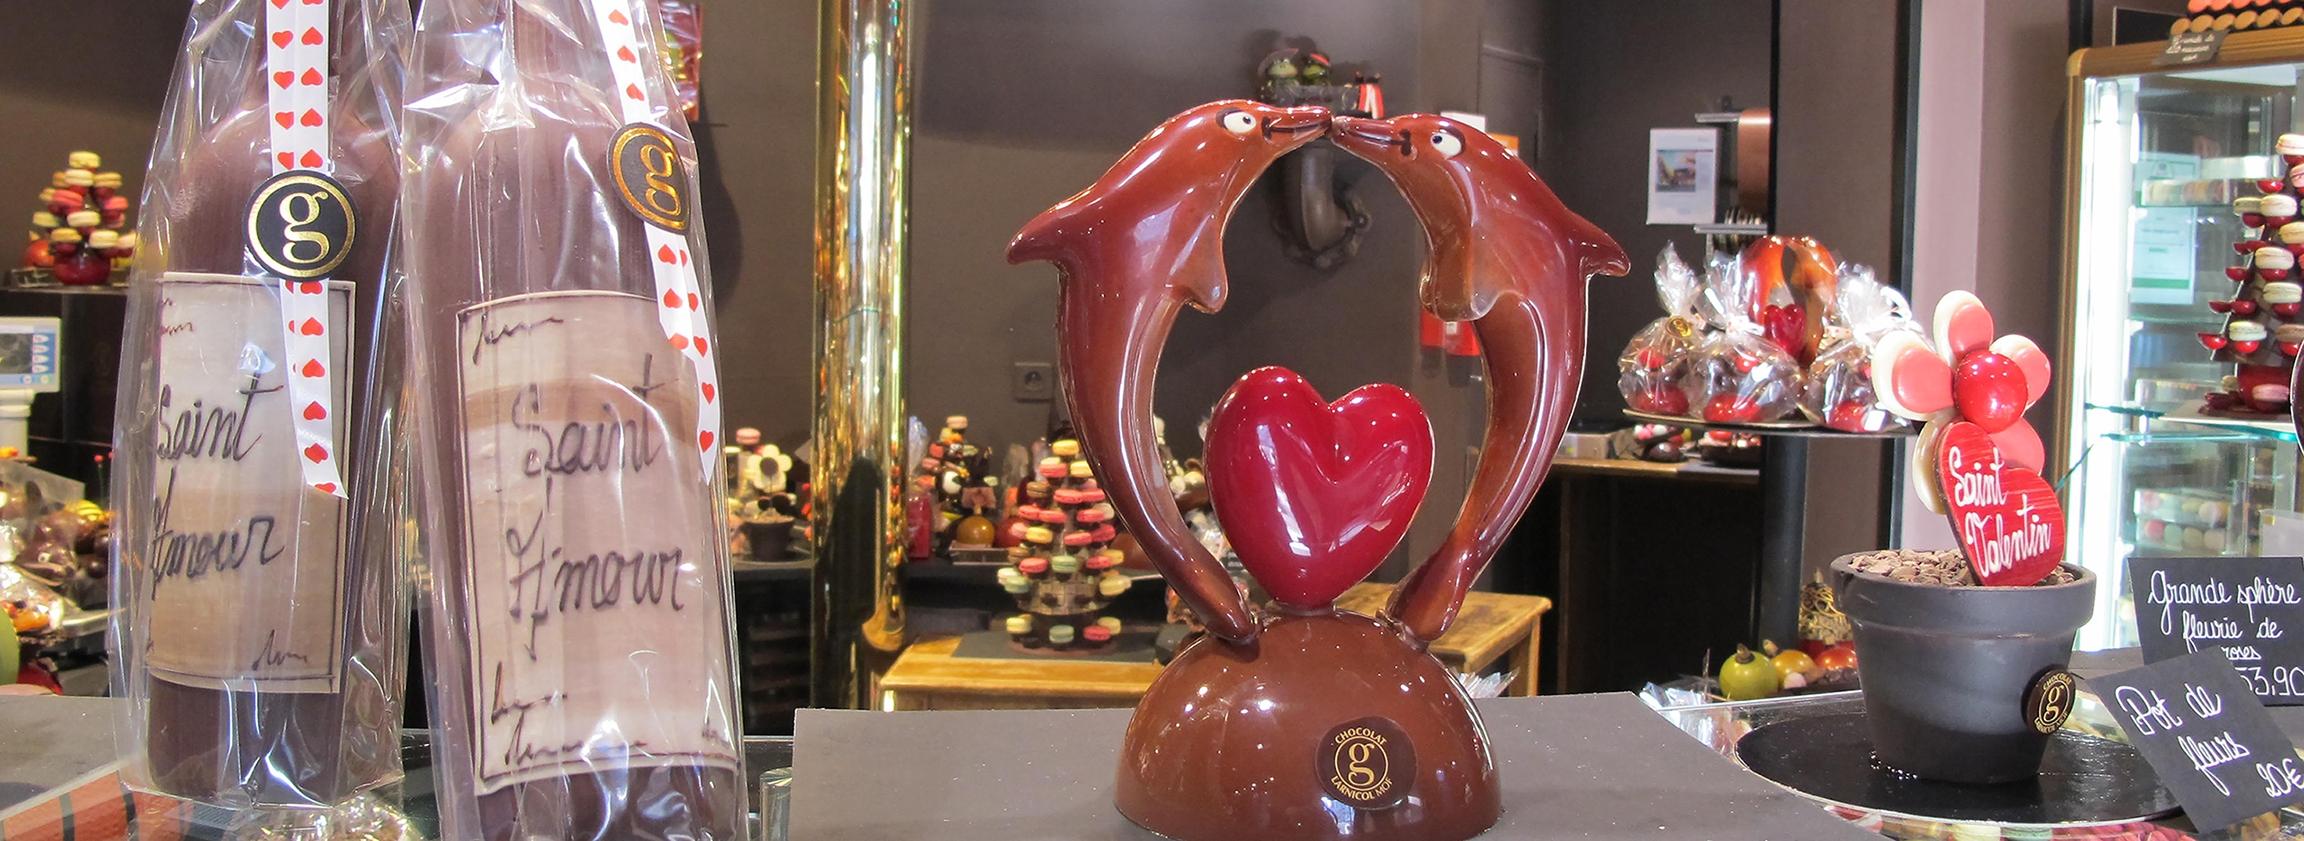 Gourmet activities in Paris for Valentines Day